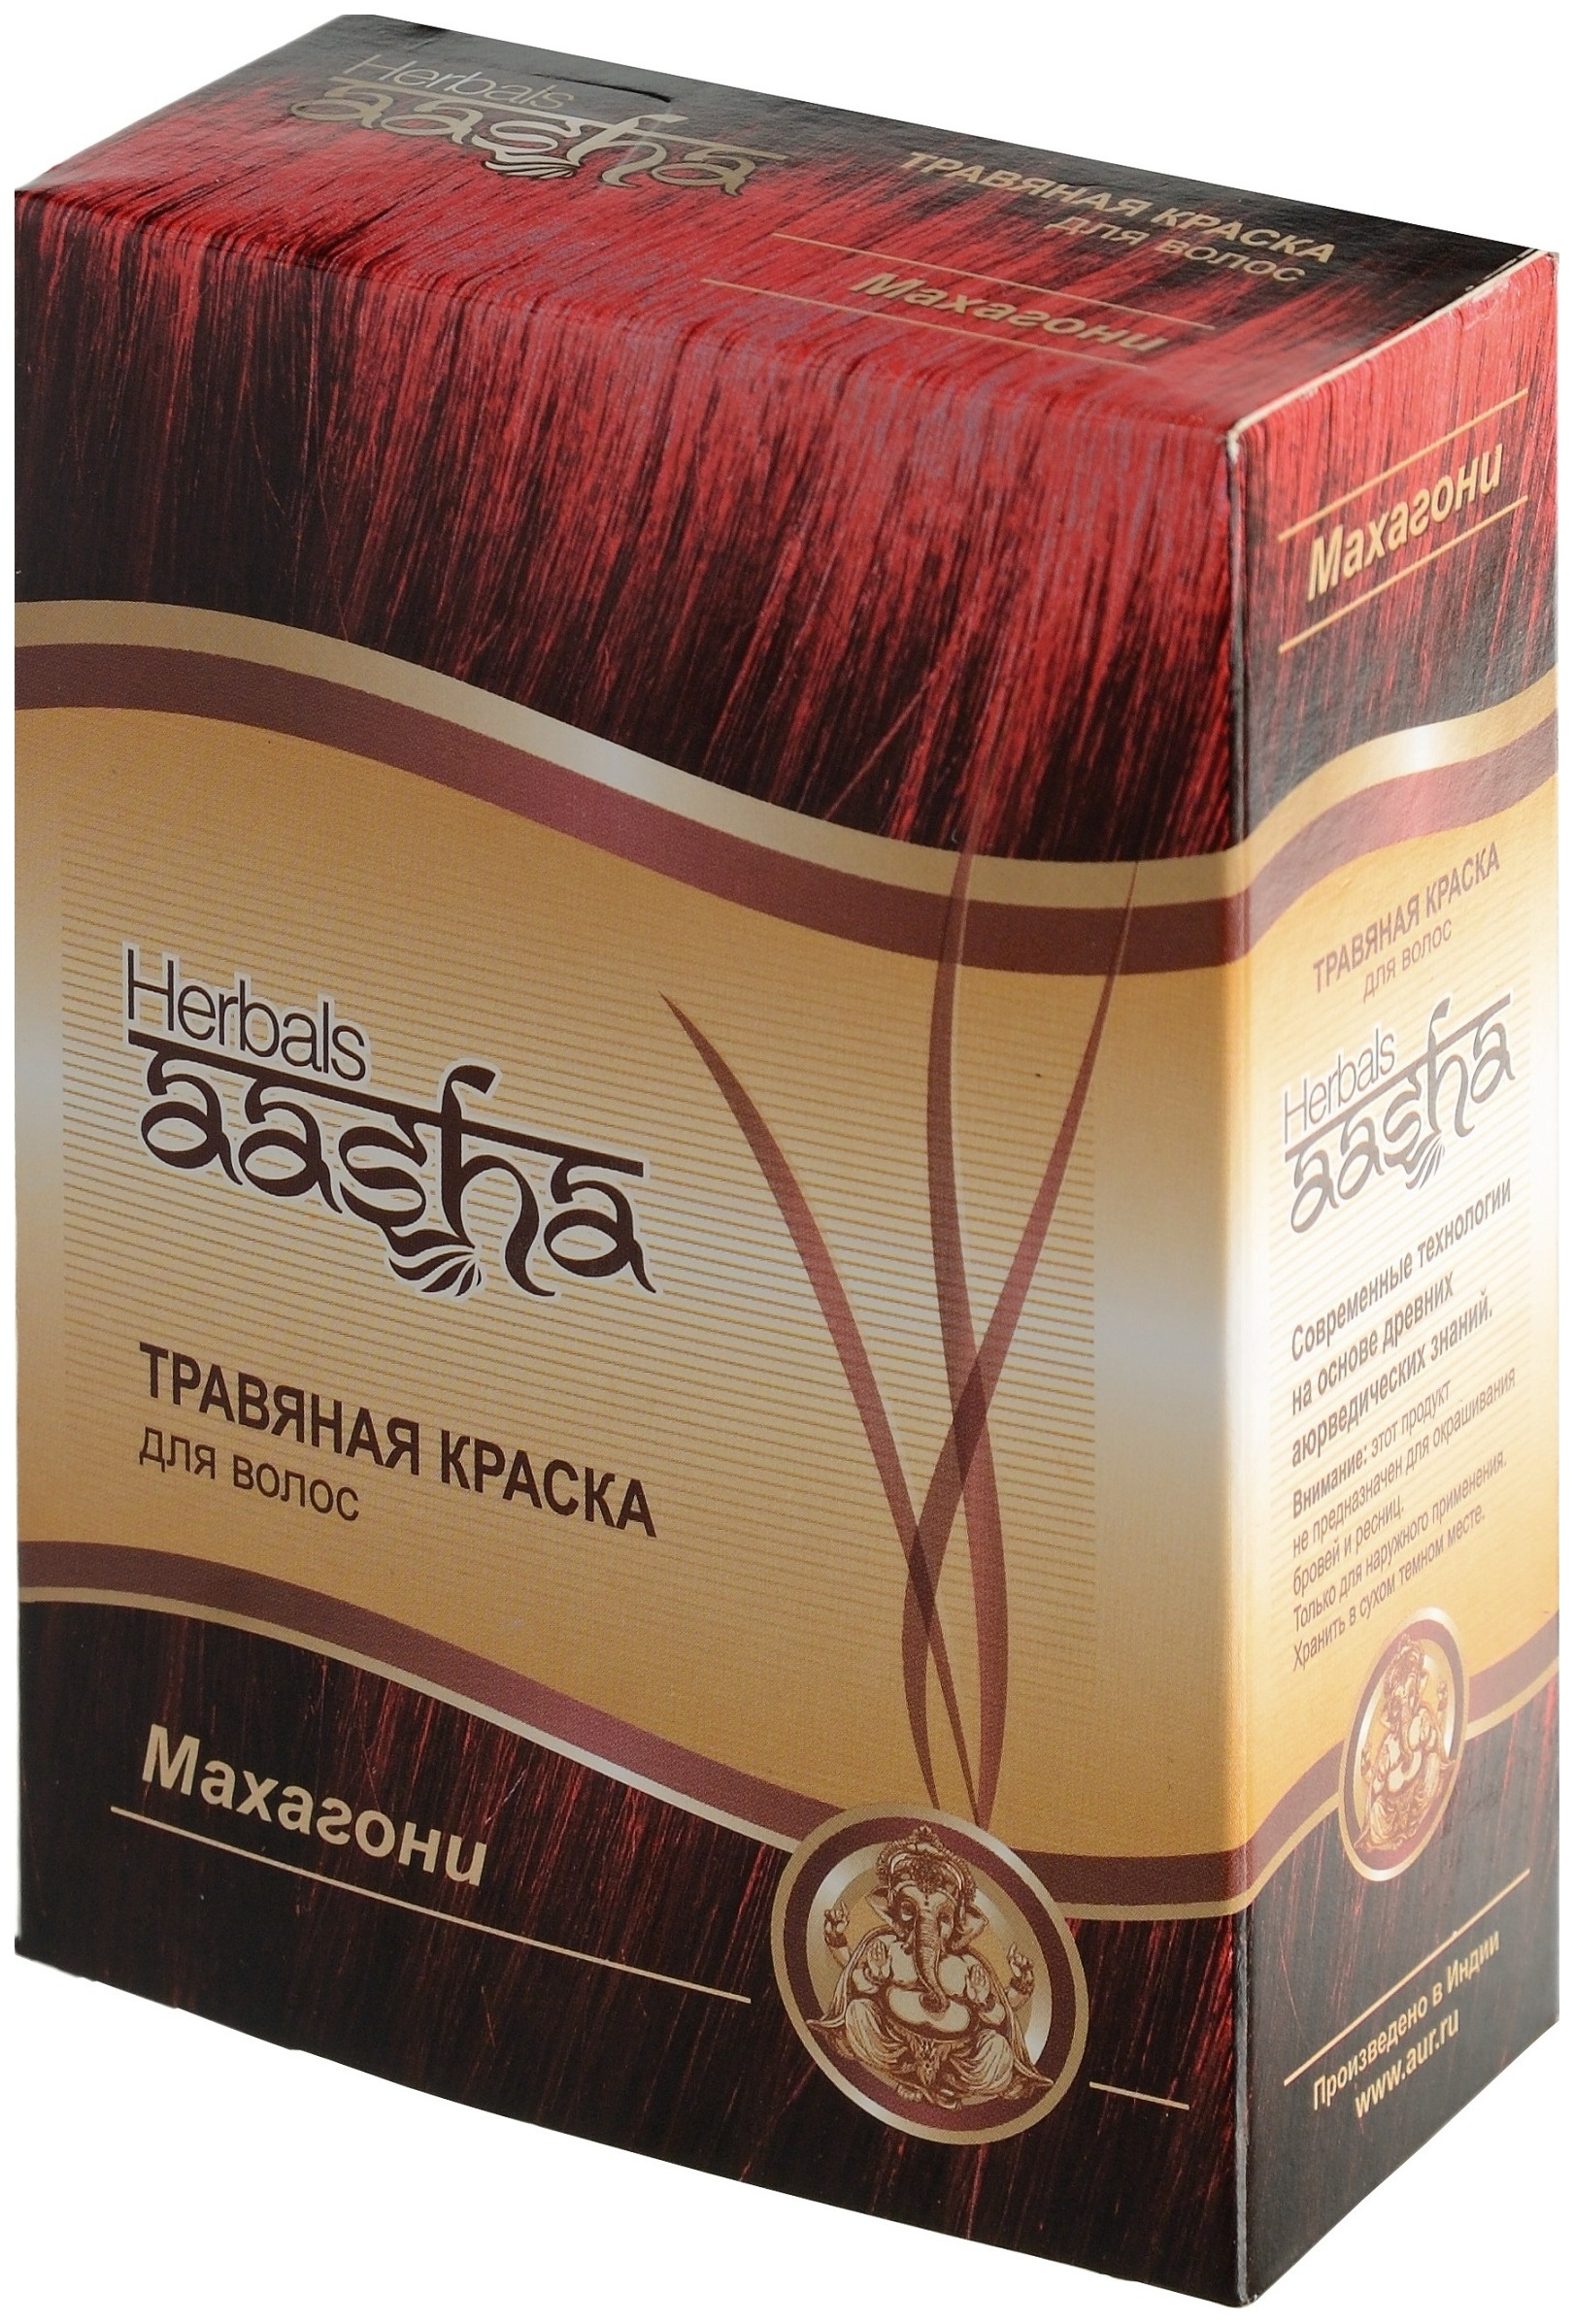 Краска для волос Aasha Травяная Махагони